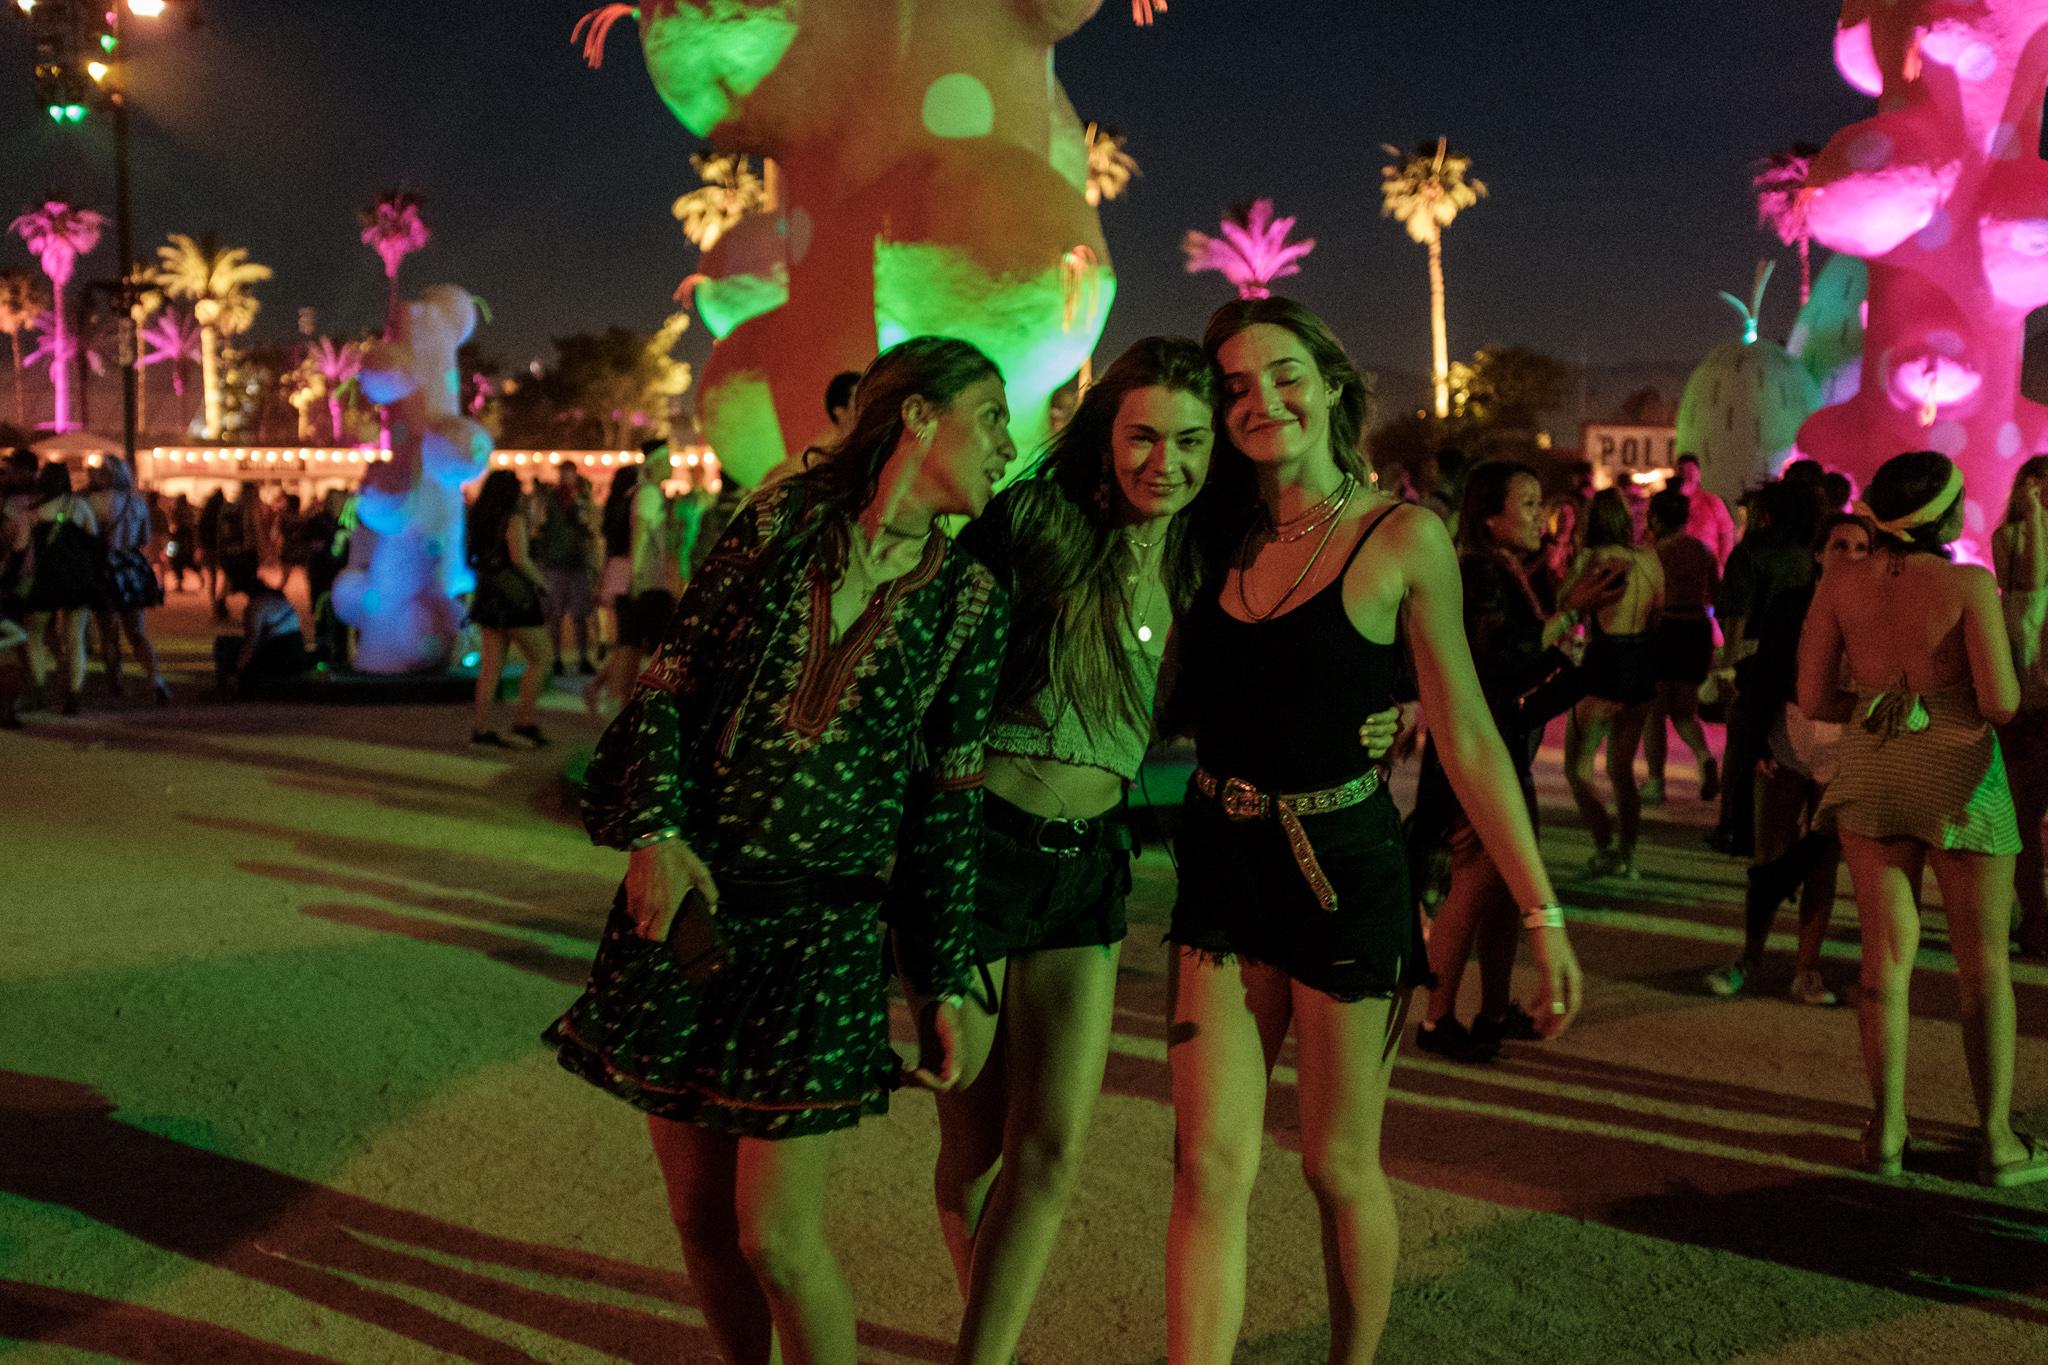 170423 Coachella 17 w2 2152.jpg